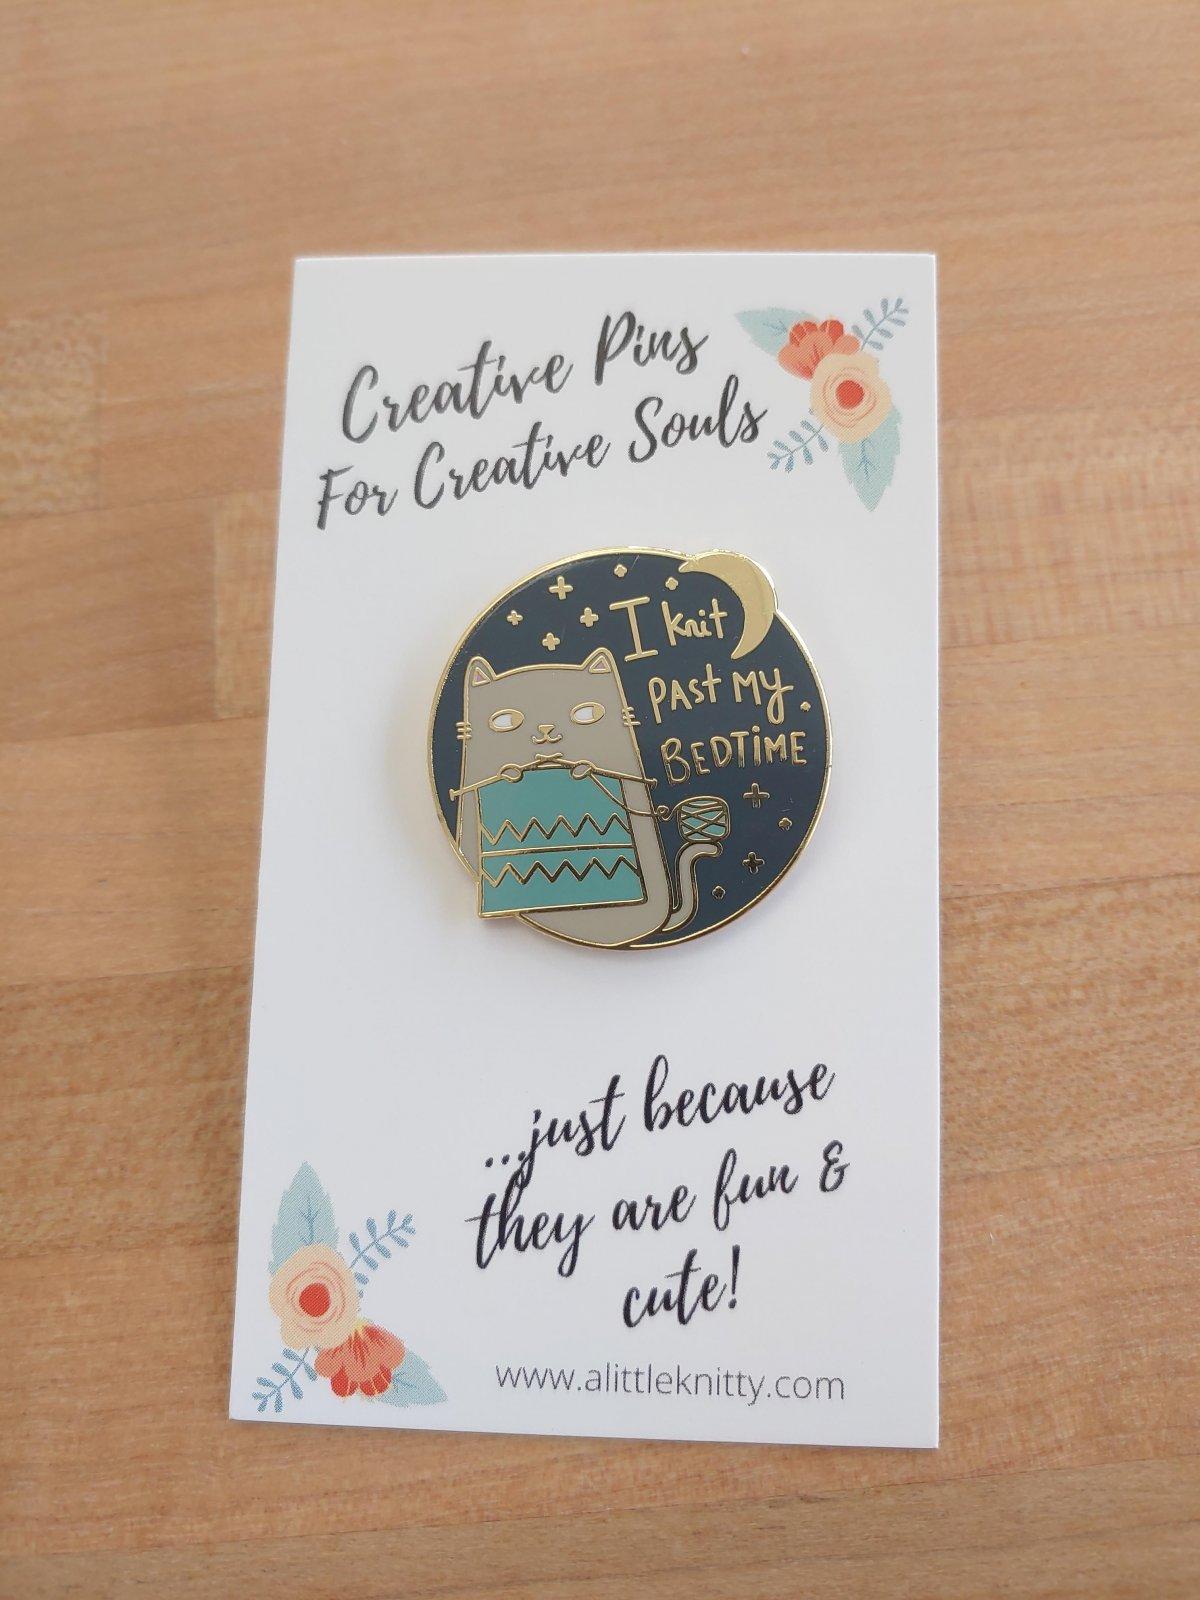 Creative Pins for Creative Souls